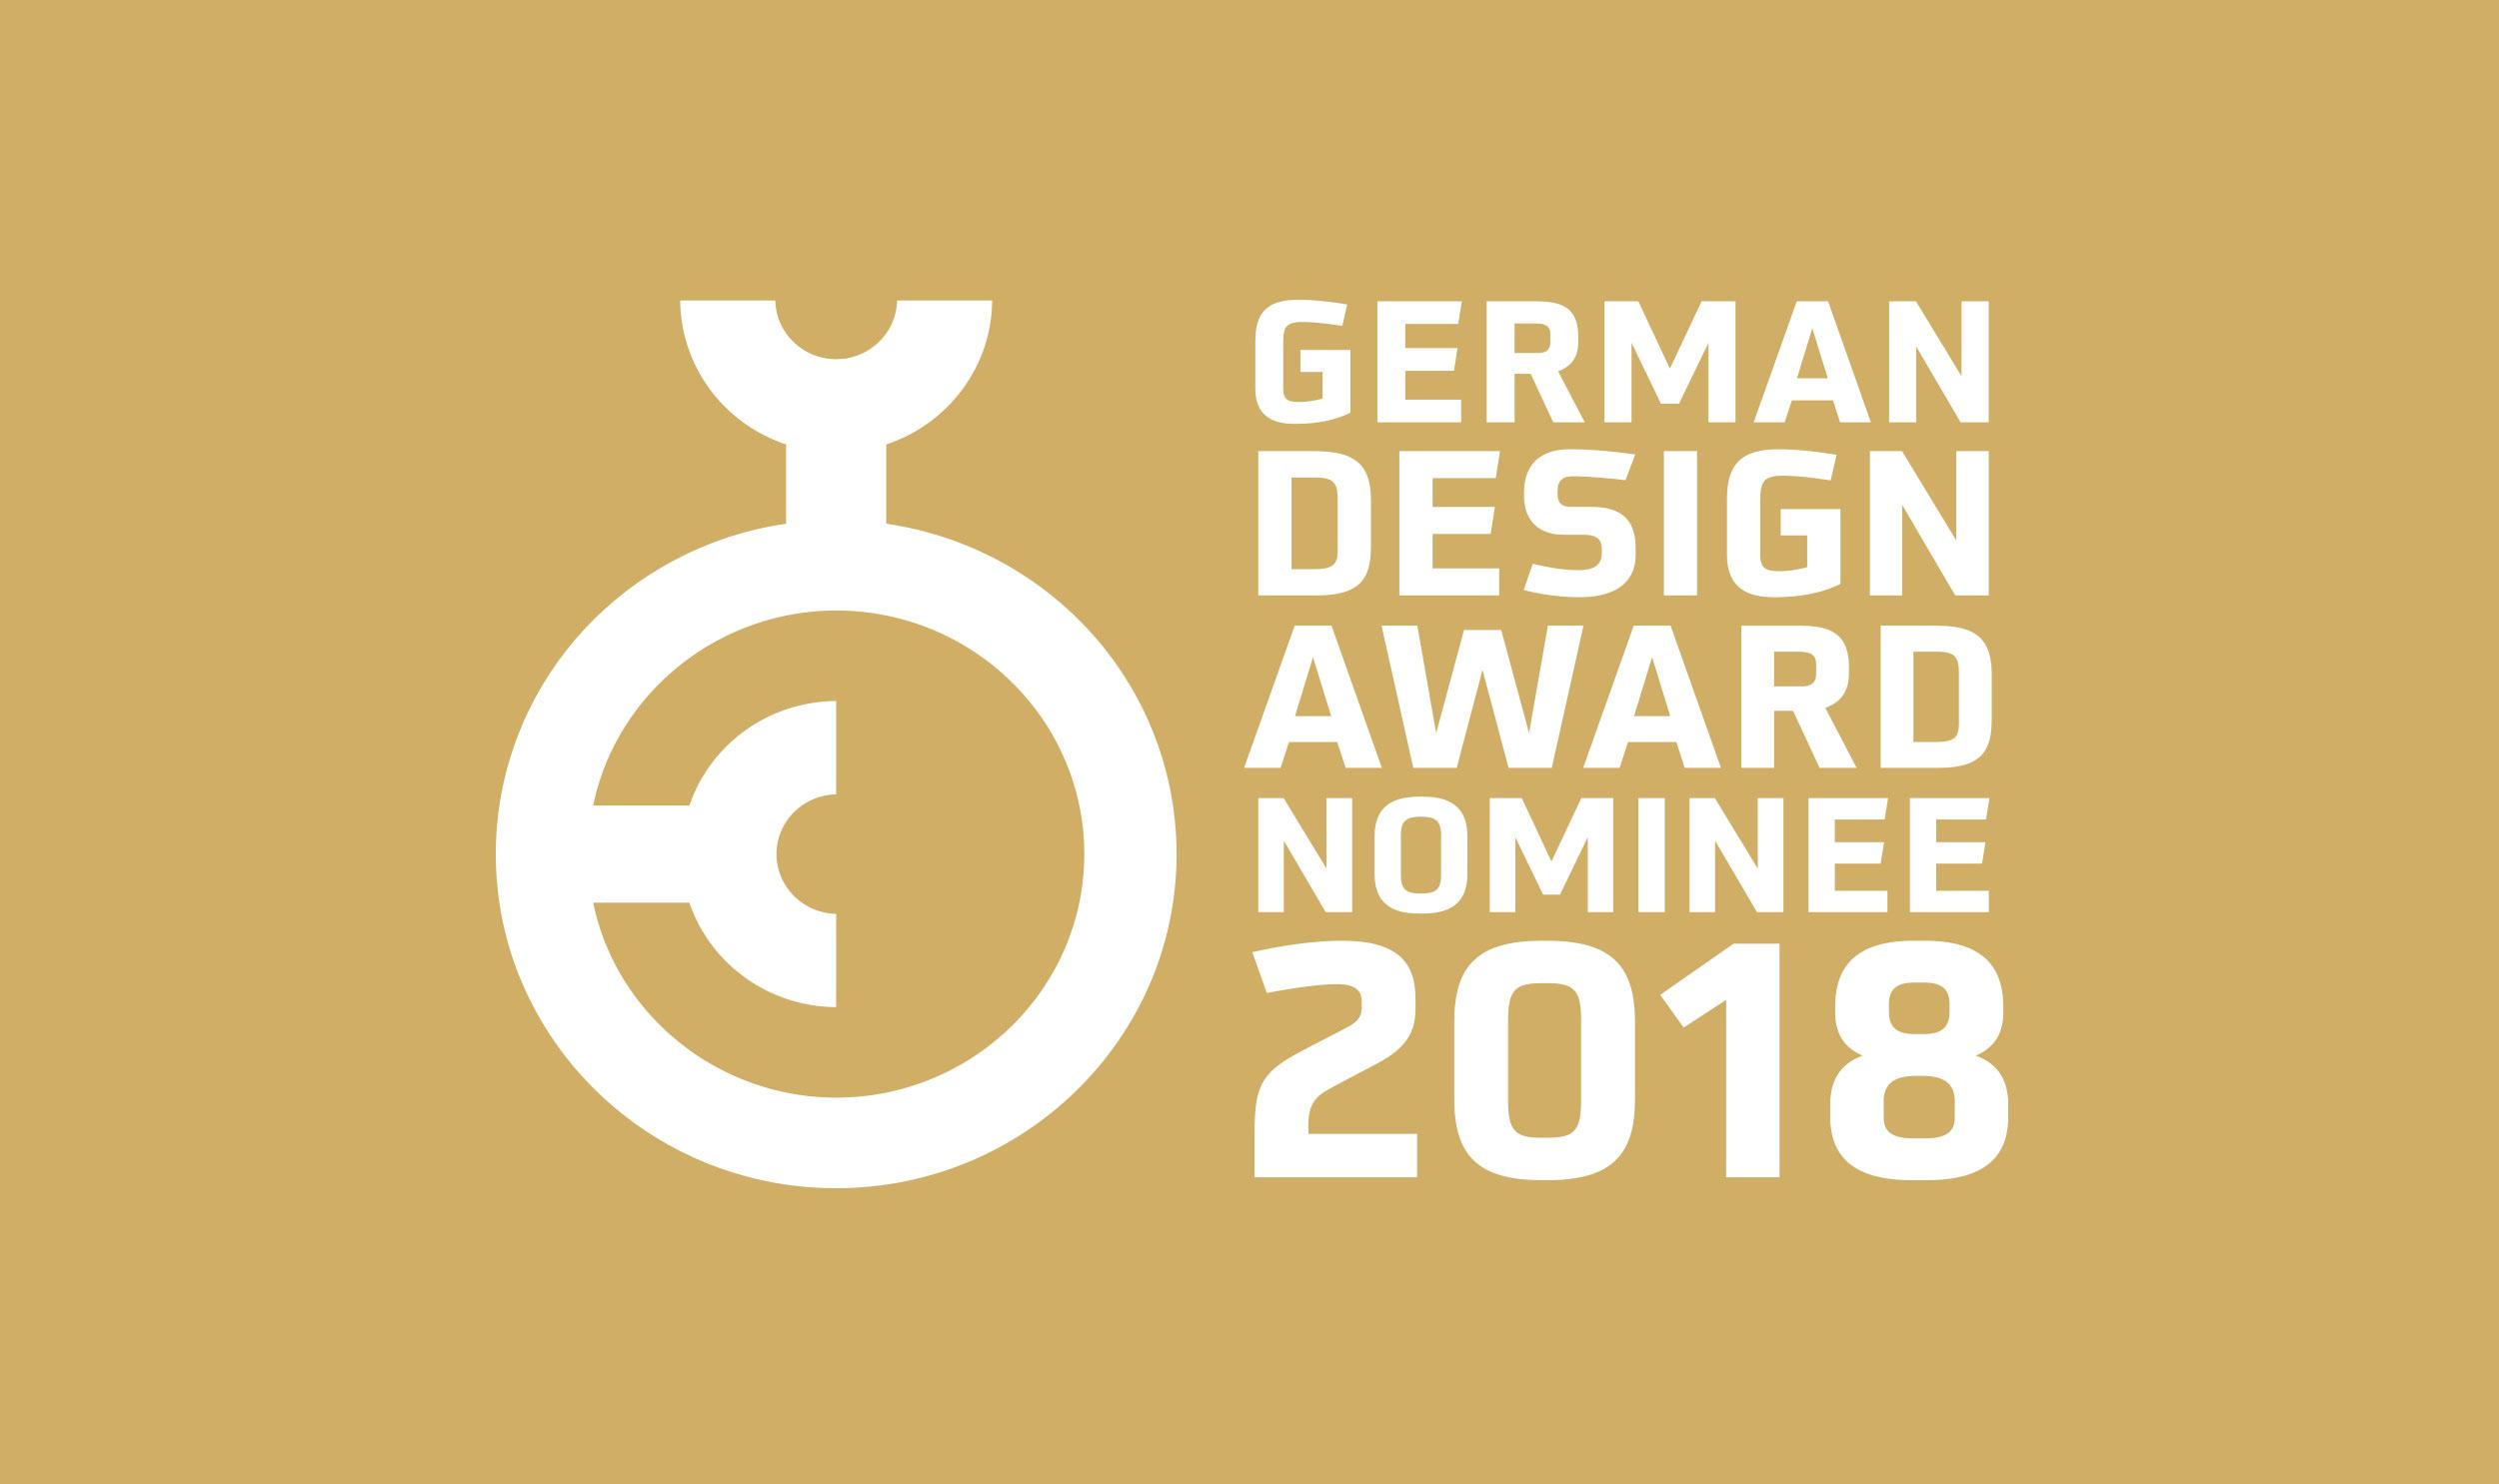 AWARD_German-Design-Award_2018_Nominee